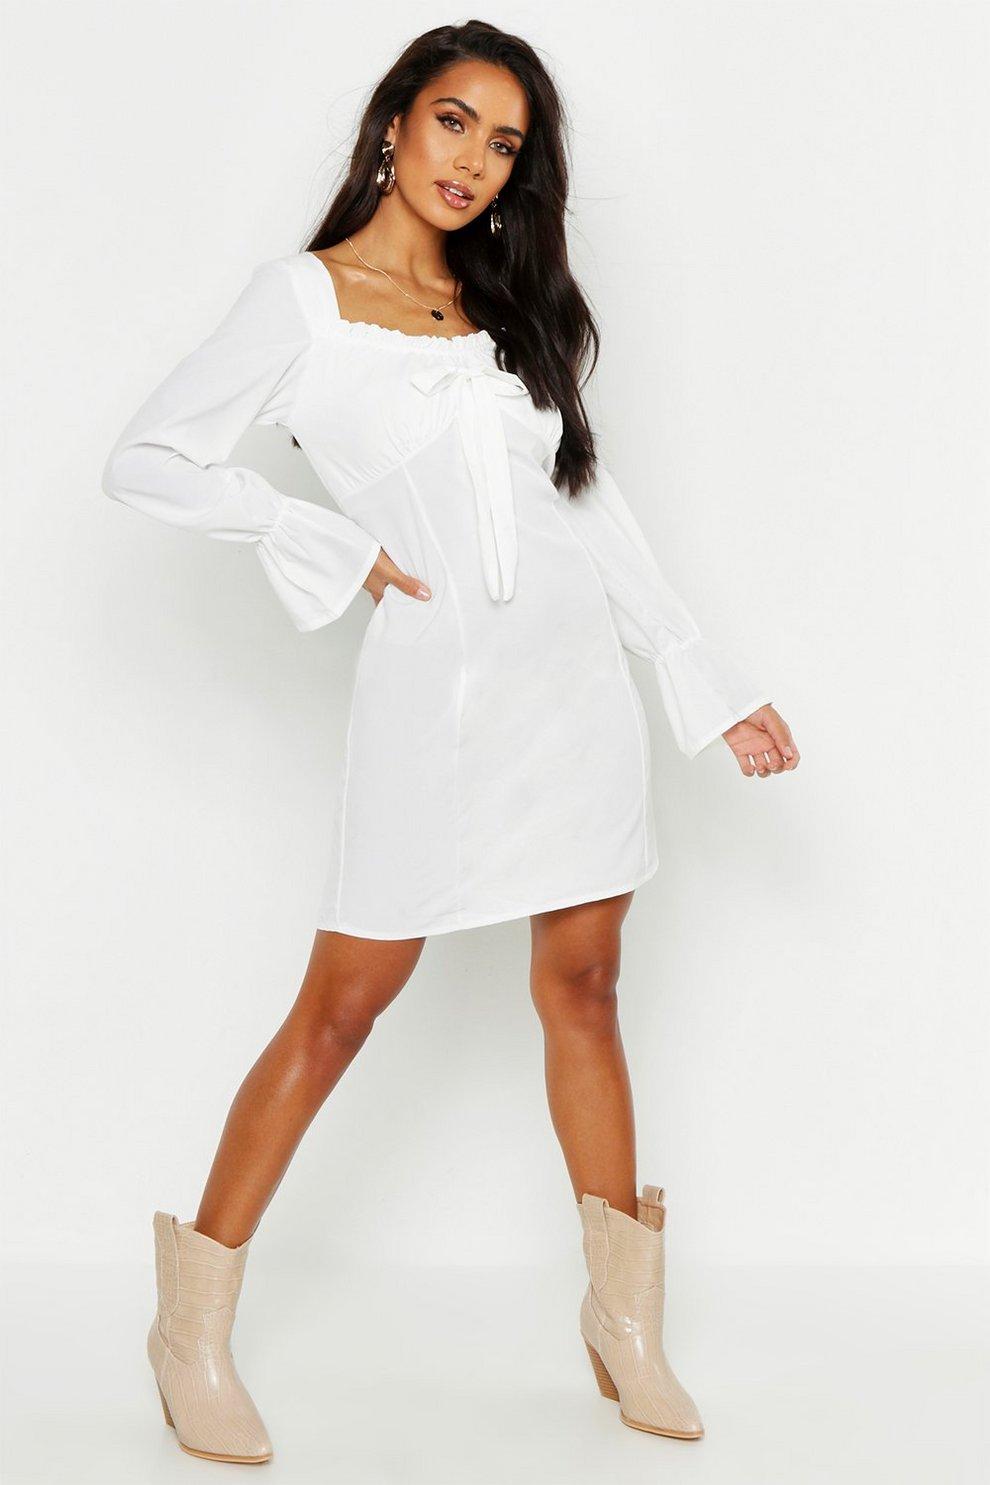 68655341c4 Off Shoulder Long Sleeve Gypsy Style Dress